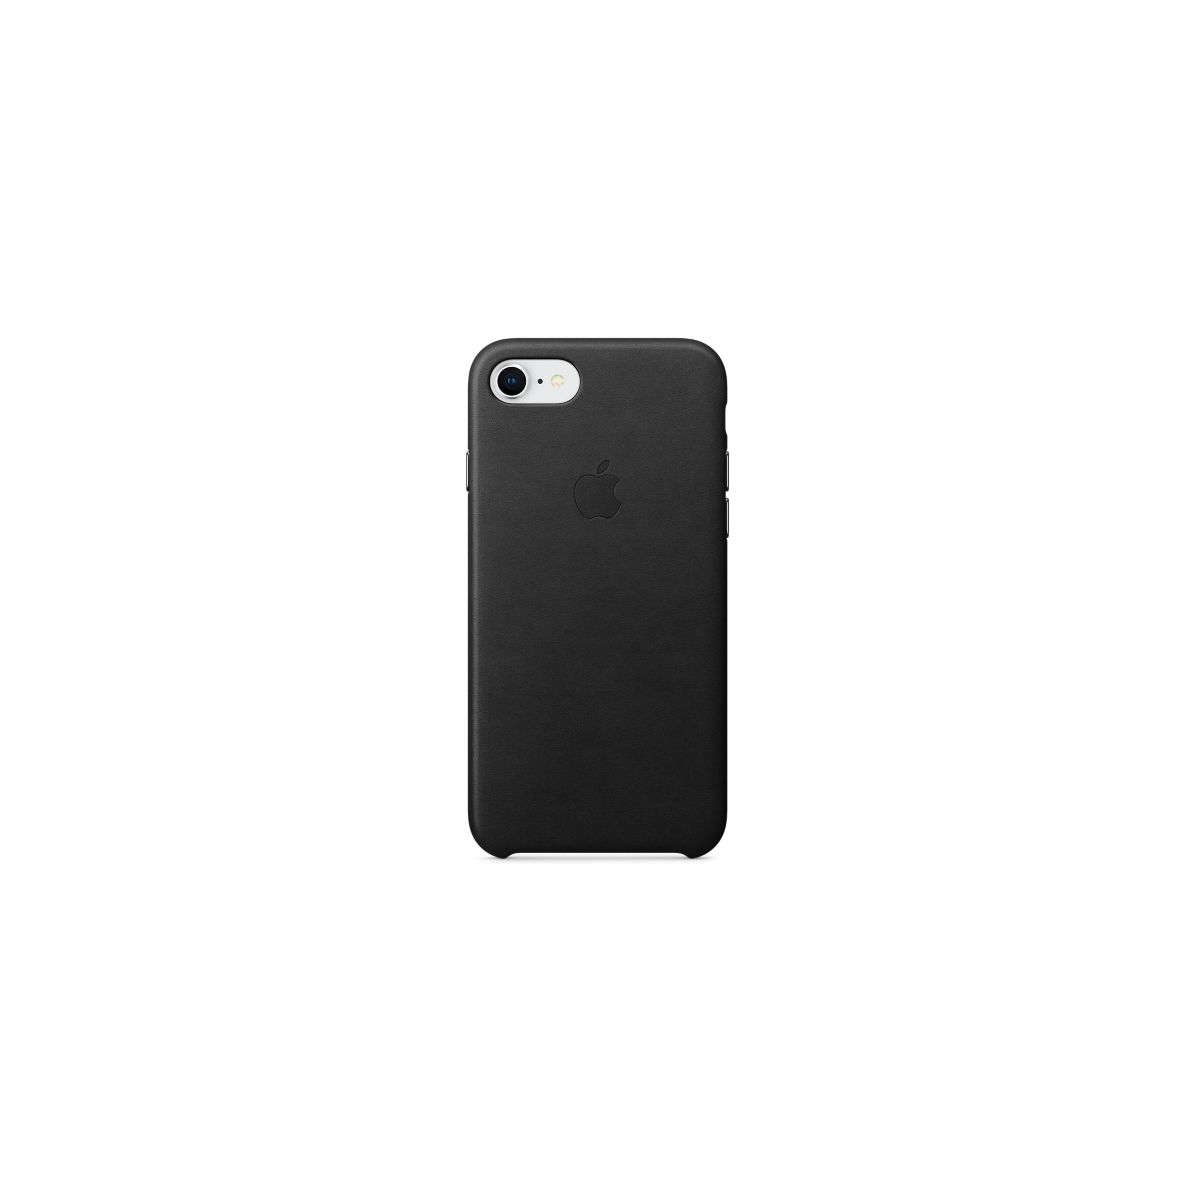 Coque APPLE iPhone 7/8 cuir noir (photo)